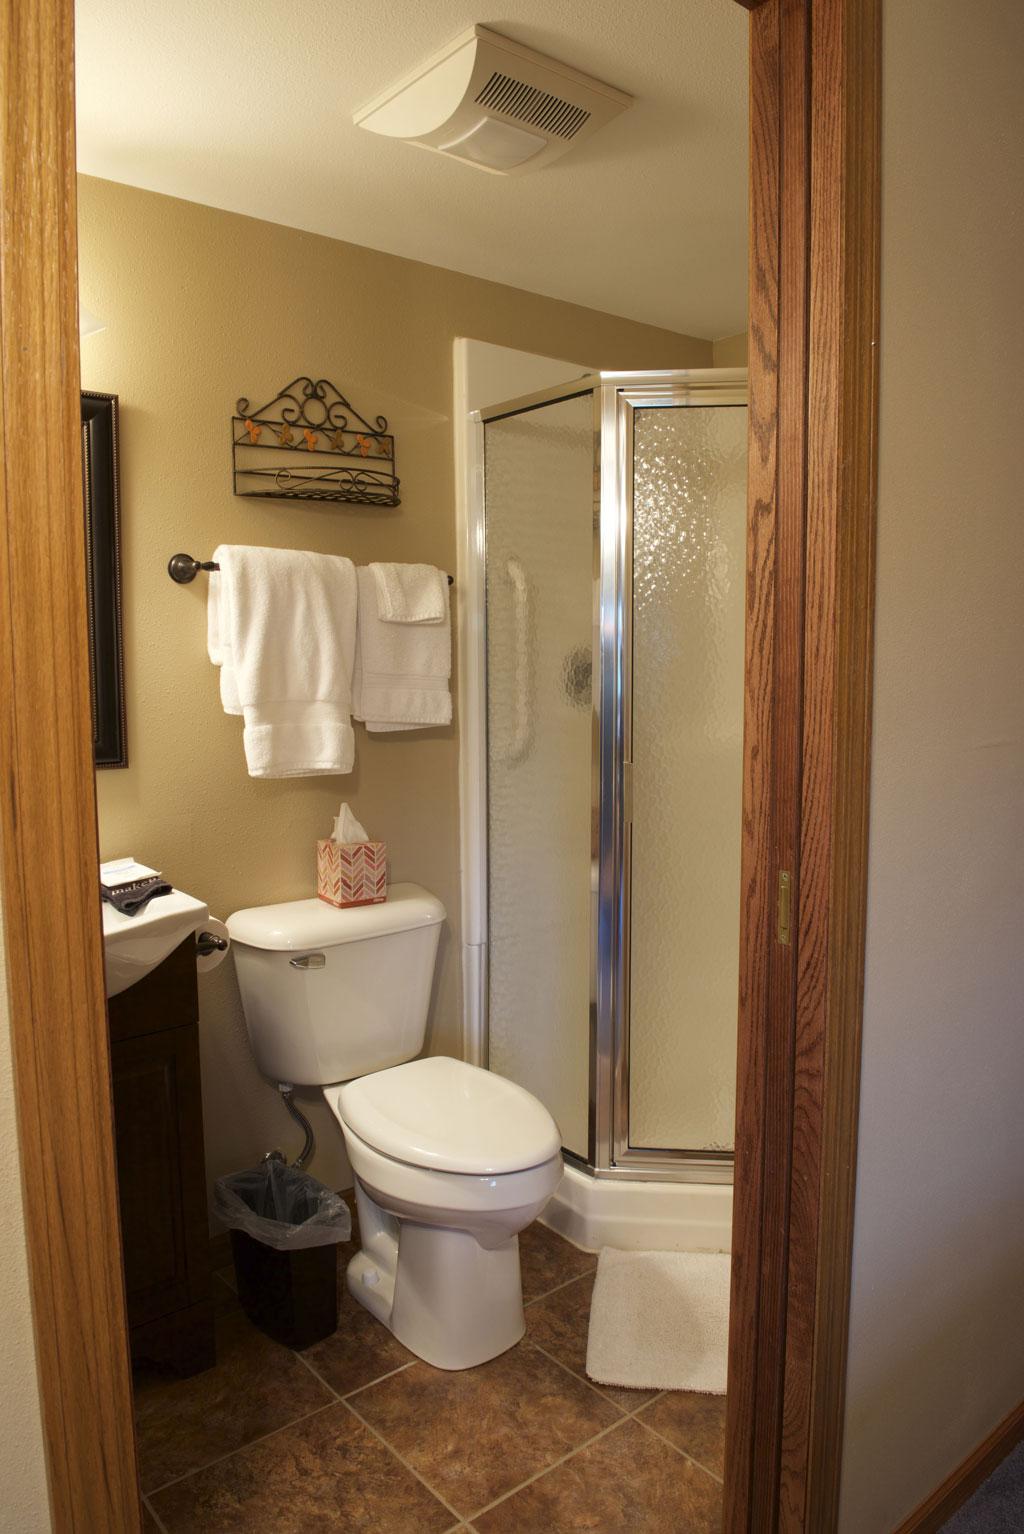 The poppy bathroom, Valley Springs Farm, Reedsburg, WI